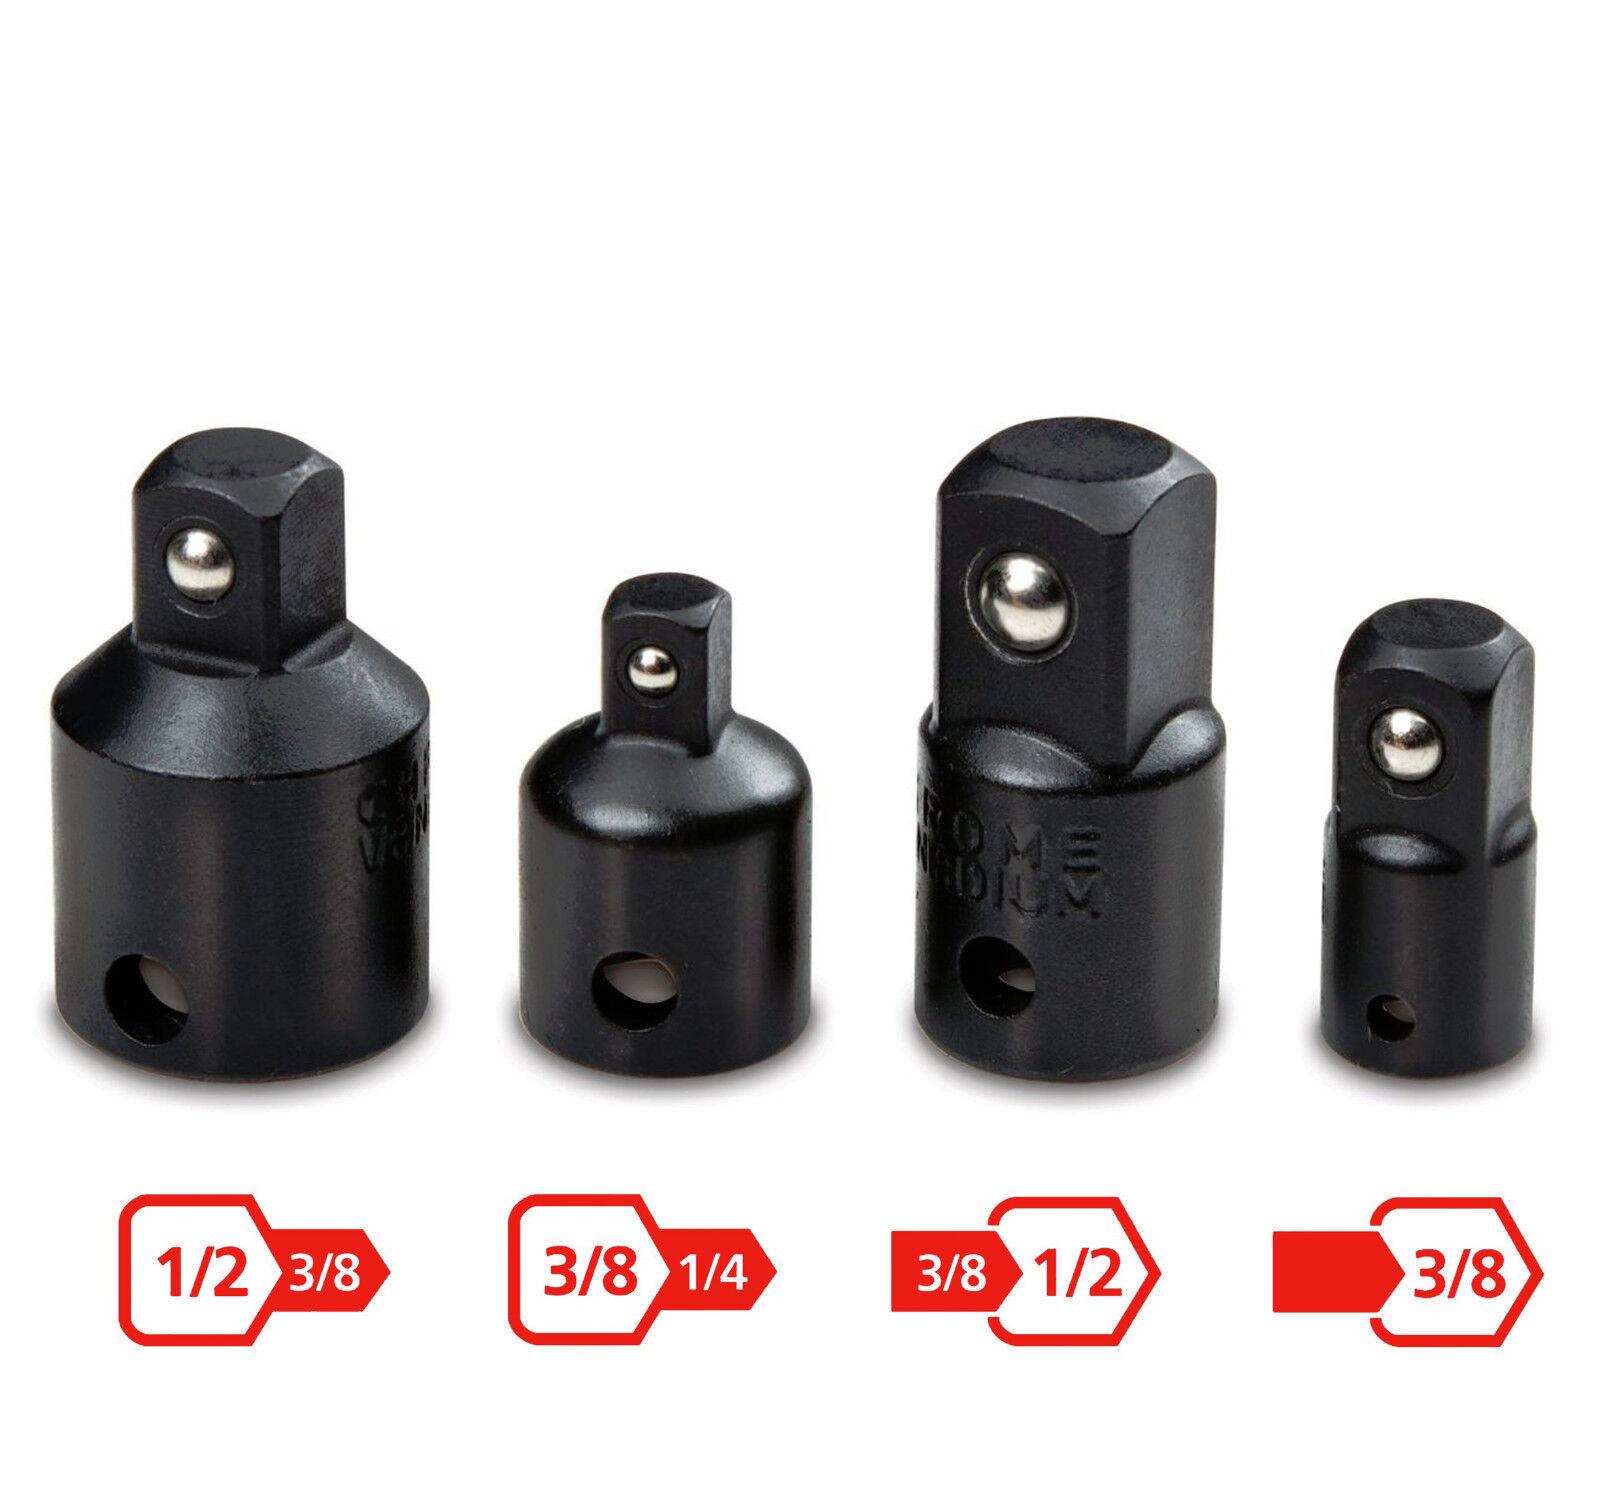 TEKTON 4957 4 pc Impact Adapter and Reducer Set NEW